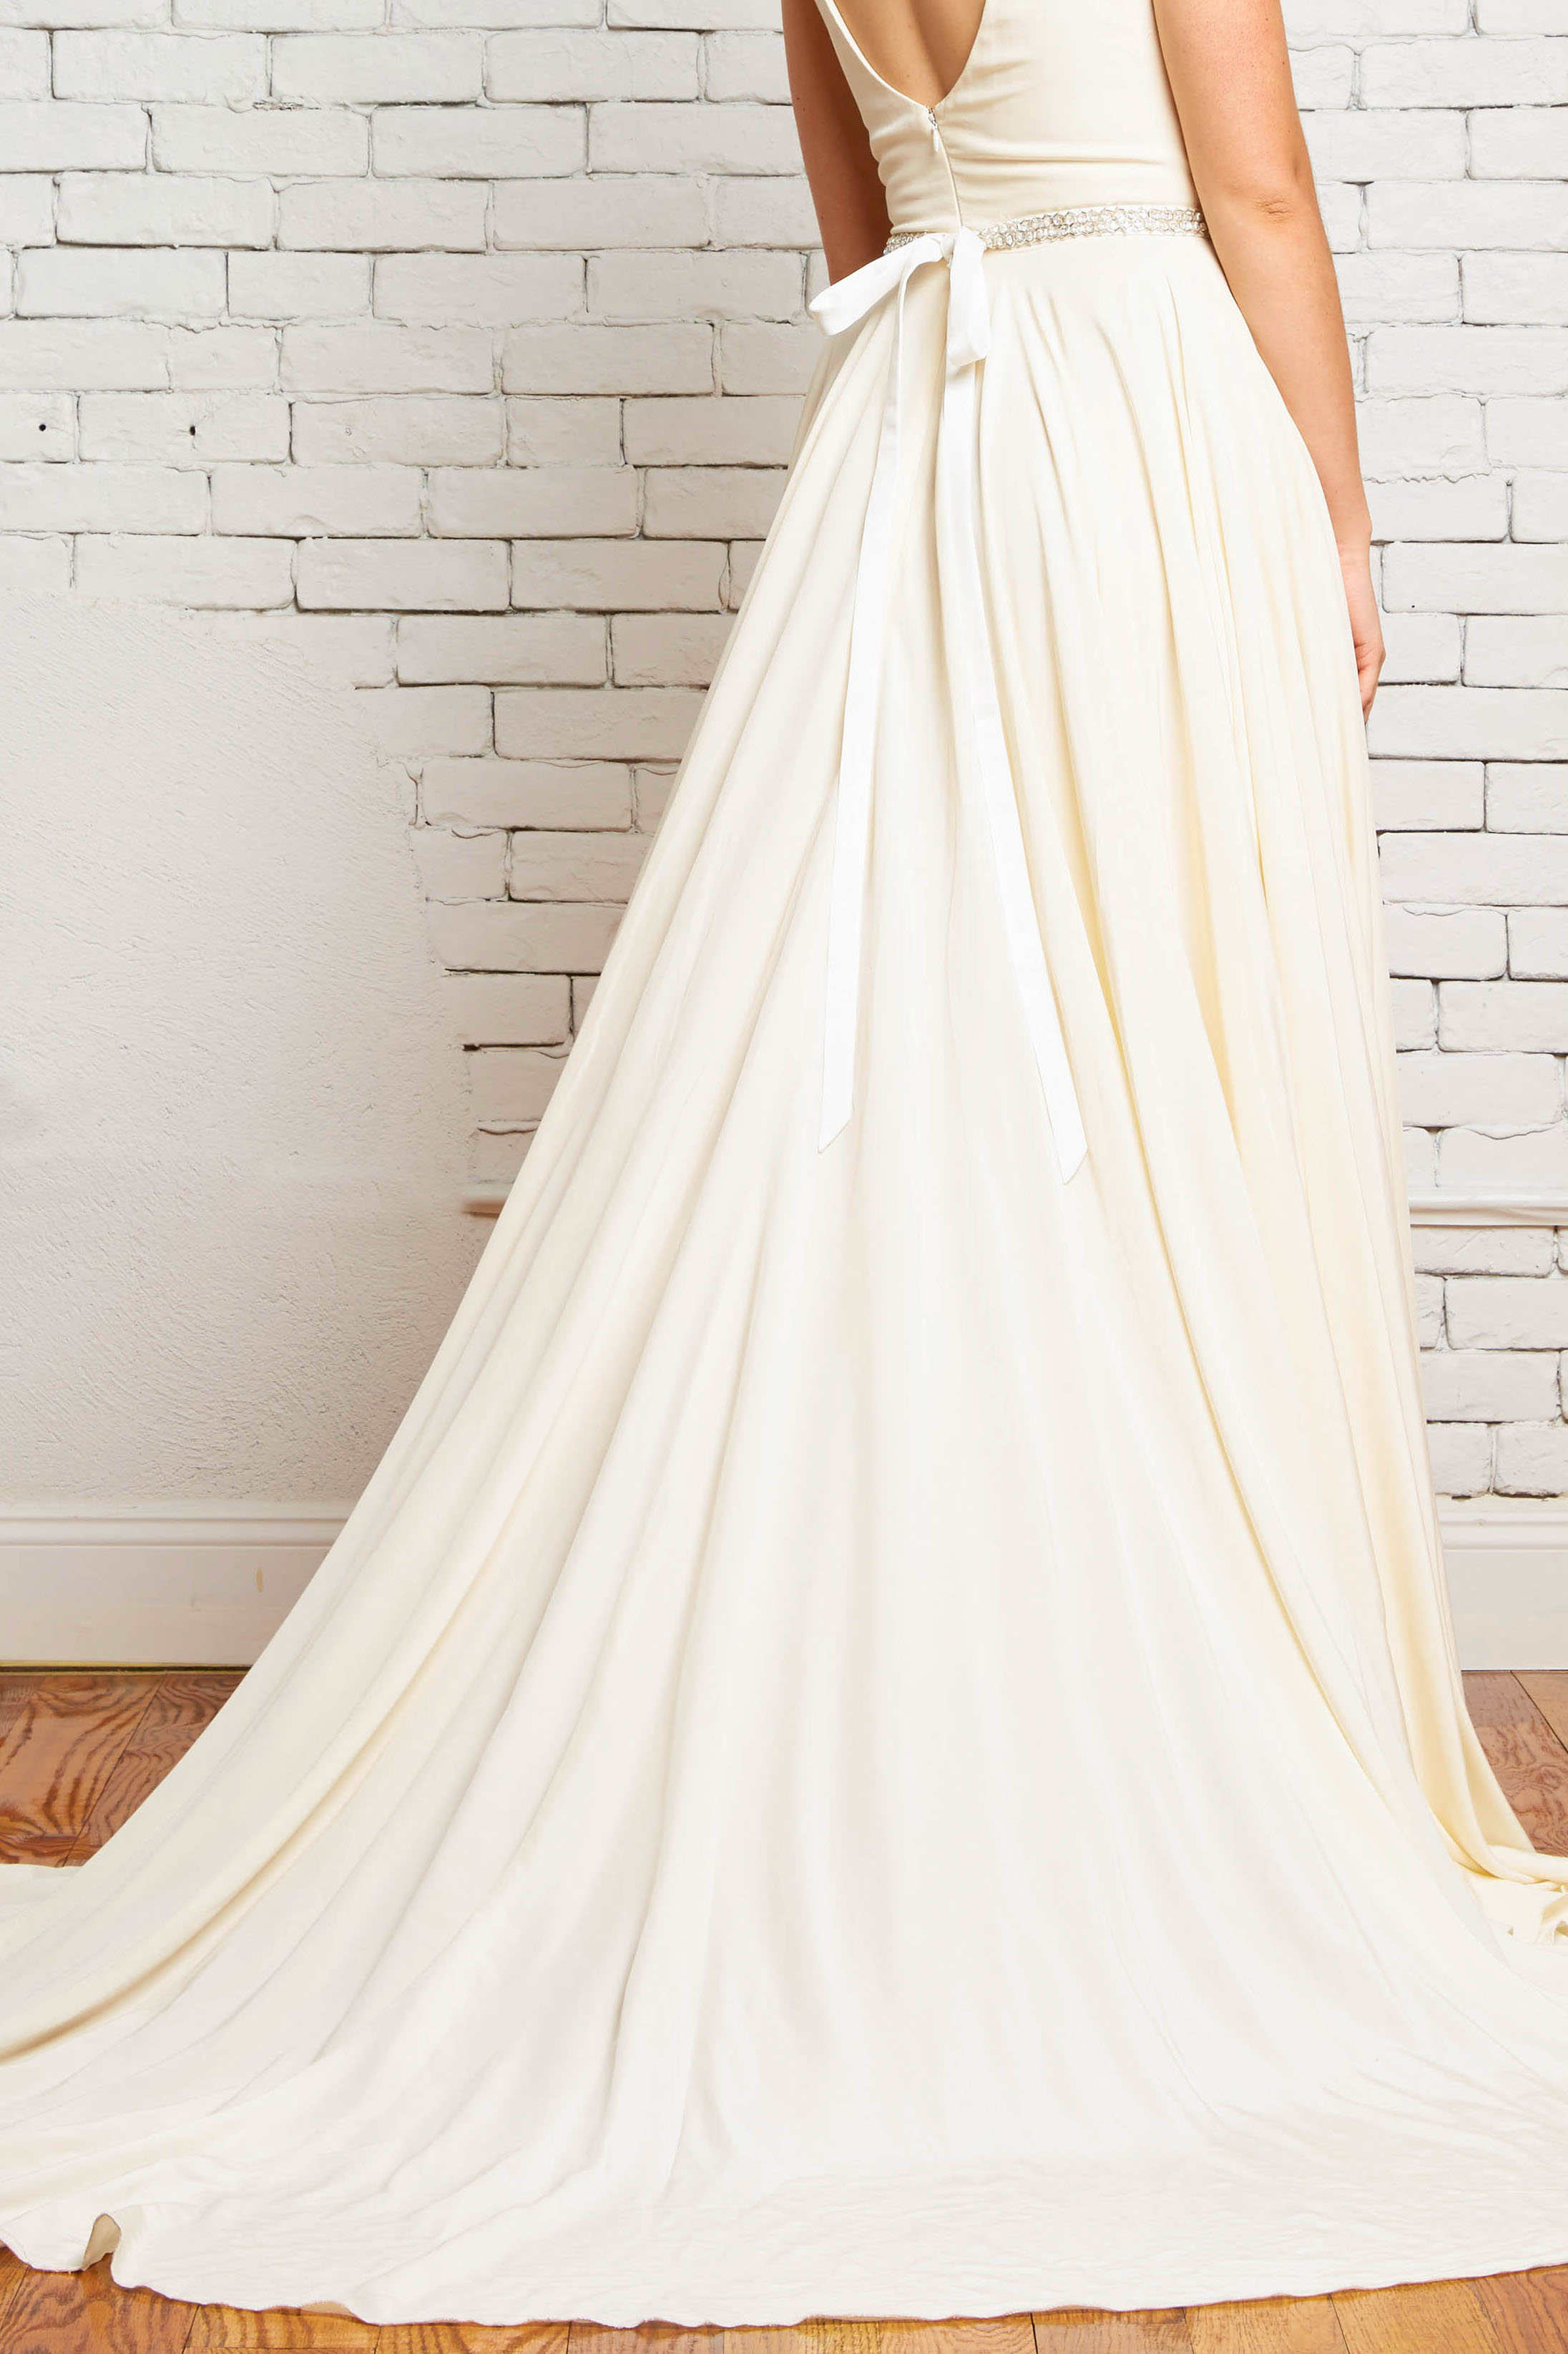 11D Hudson Back-Rebecca Schoneveld-Circle_Skirt_Dramatic_Boho_Bride_Wedding_Style.jpg